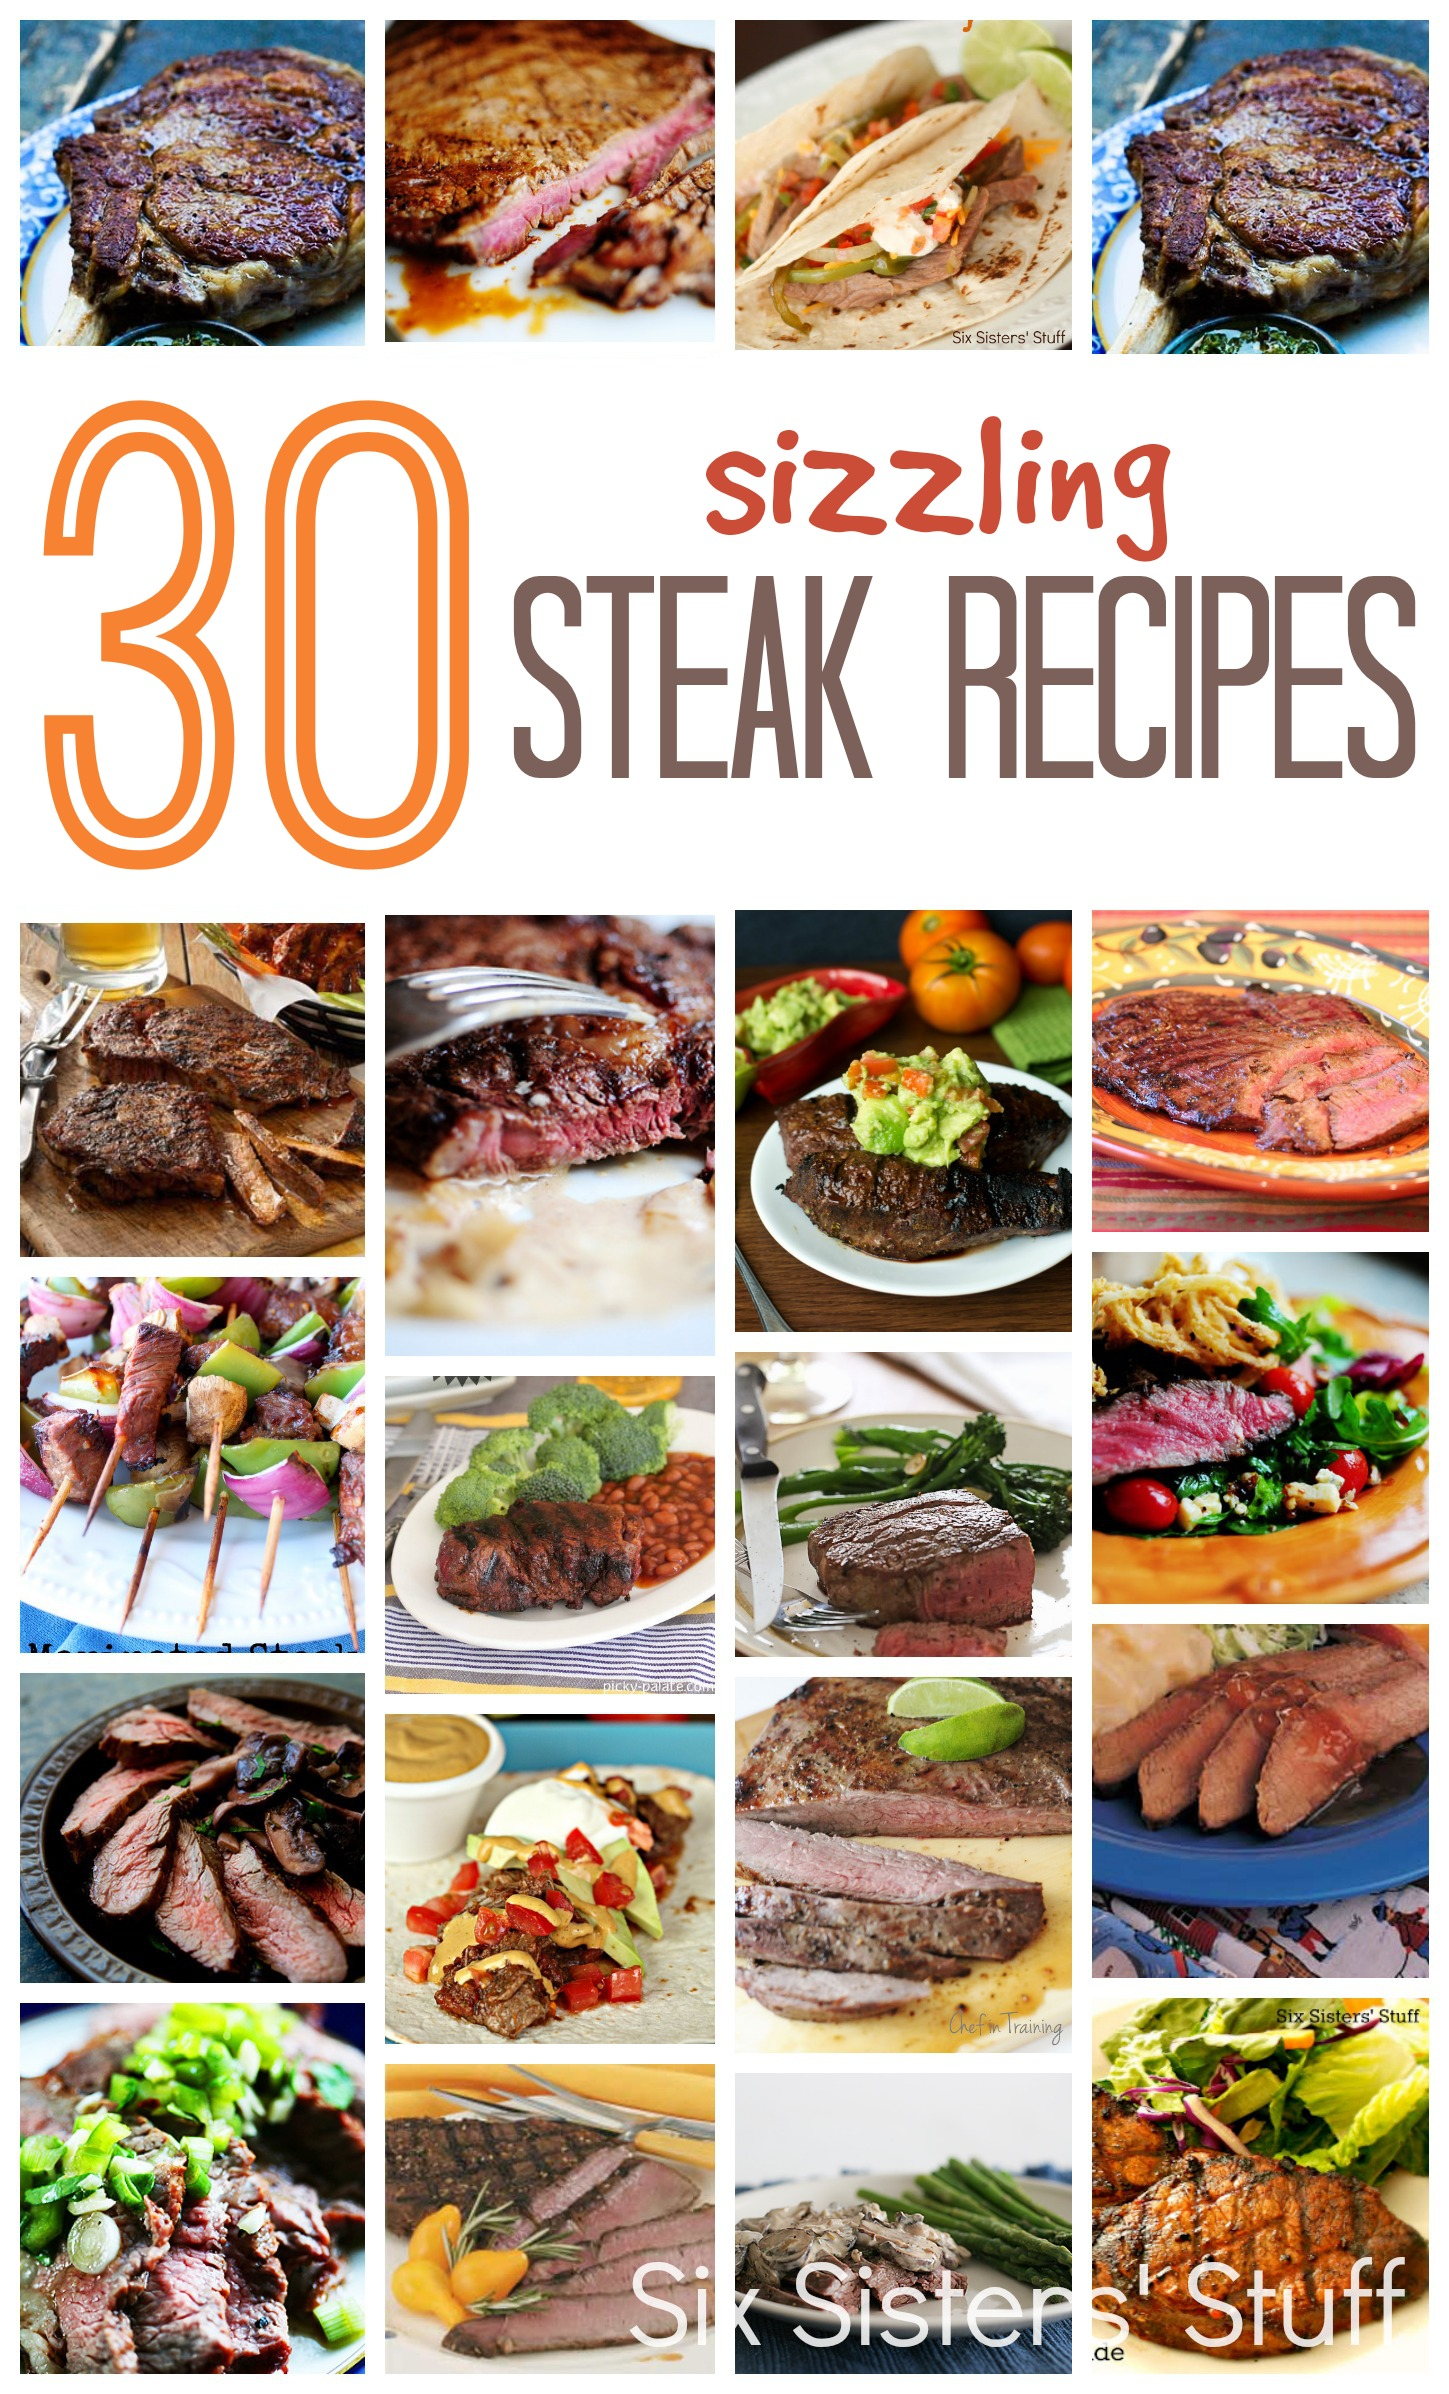 30-Sizzling-Steak-Recipes